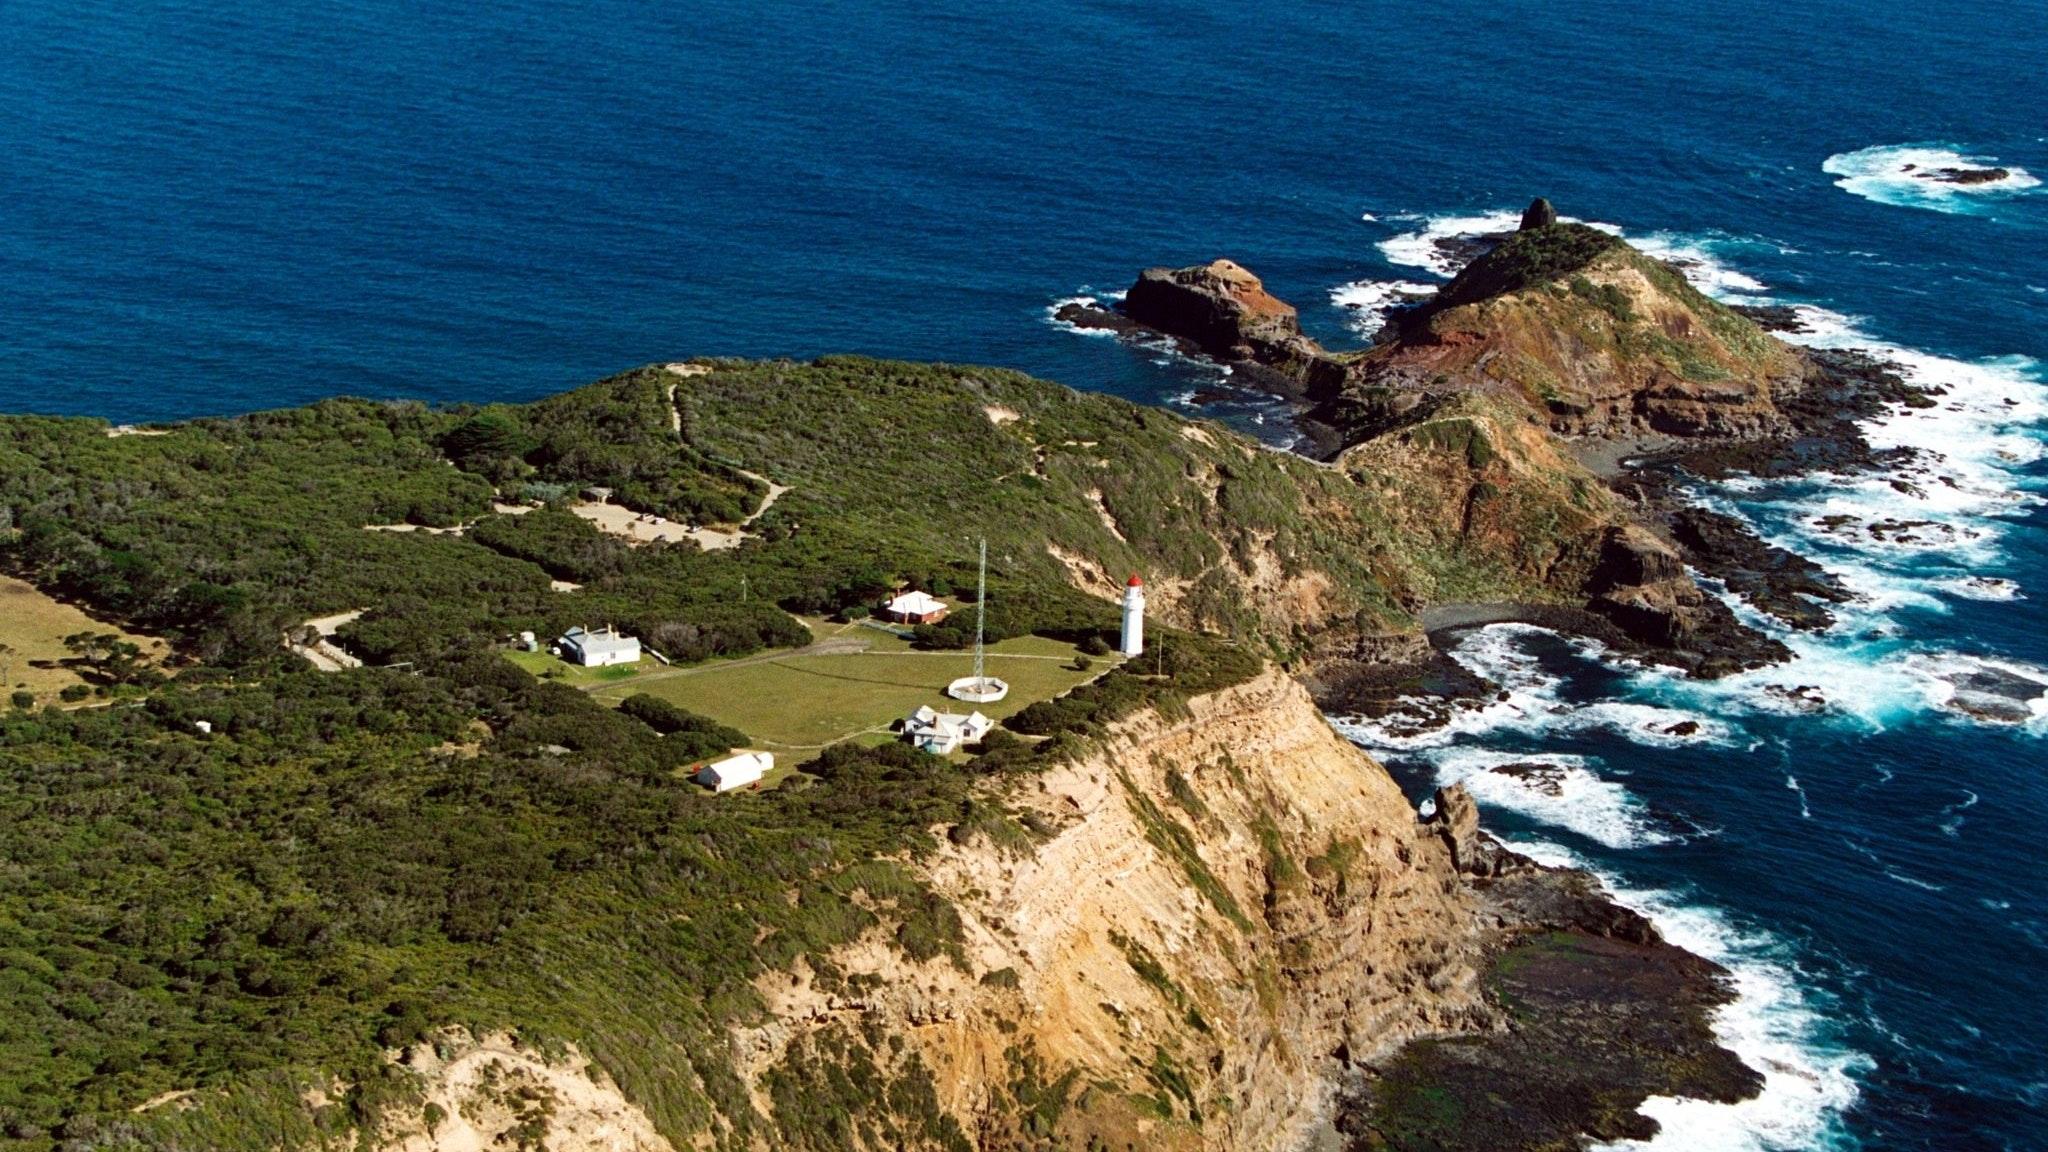 Cape Schanck Lighthouse Reserve